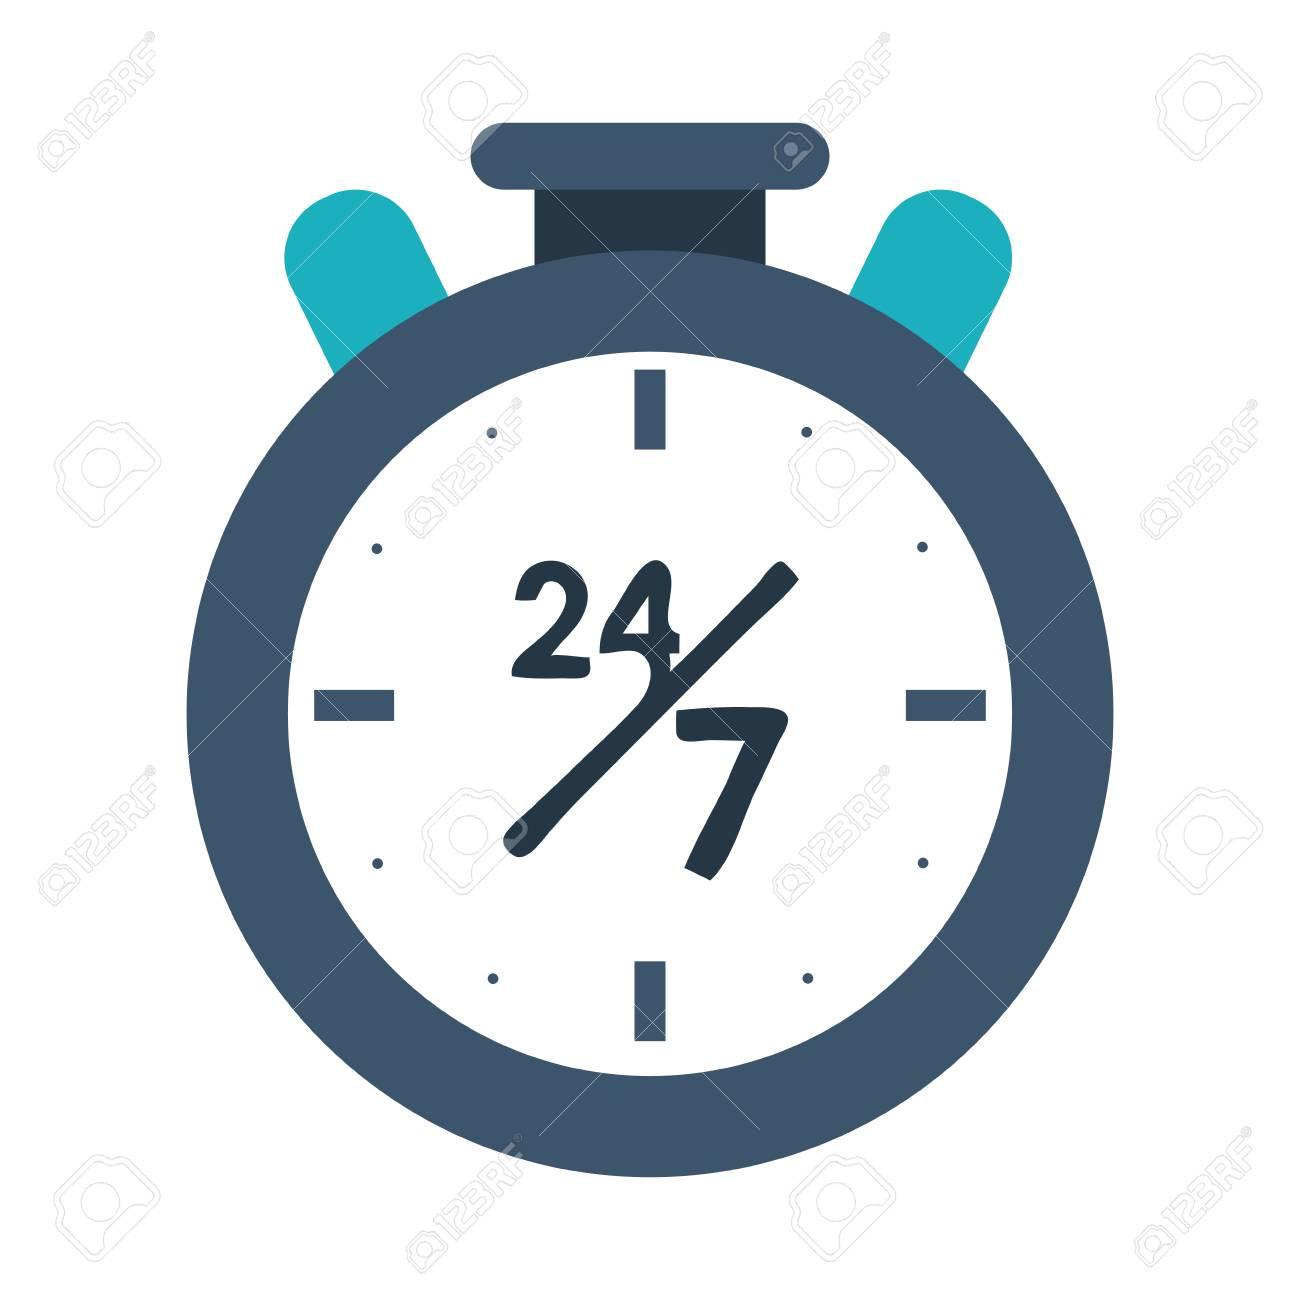 24 7 chronometer icon image vector illustration design - 85758960